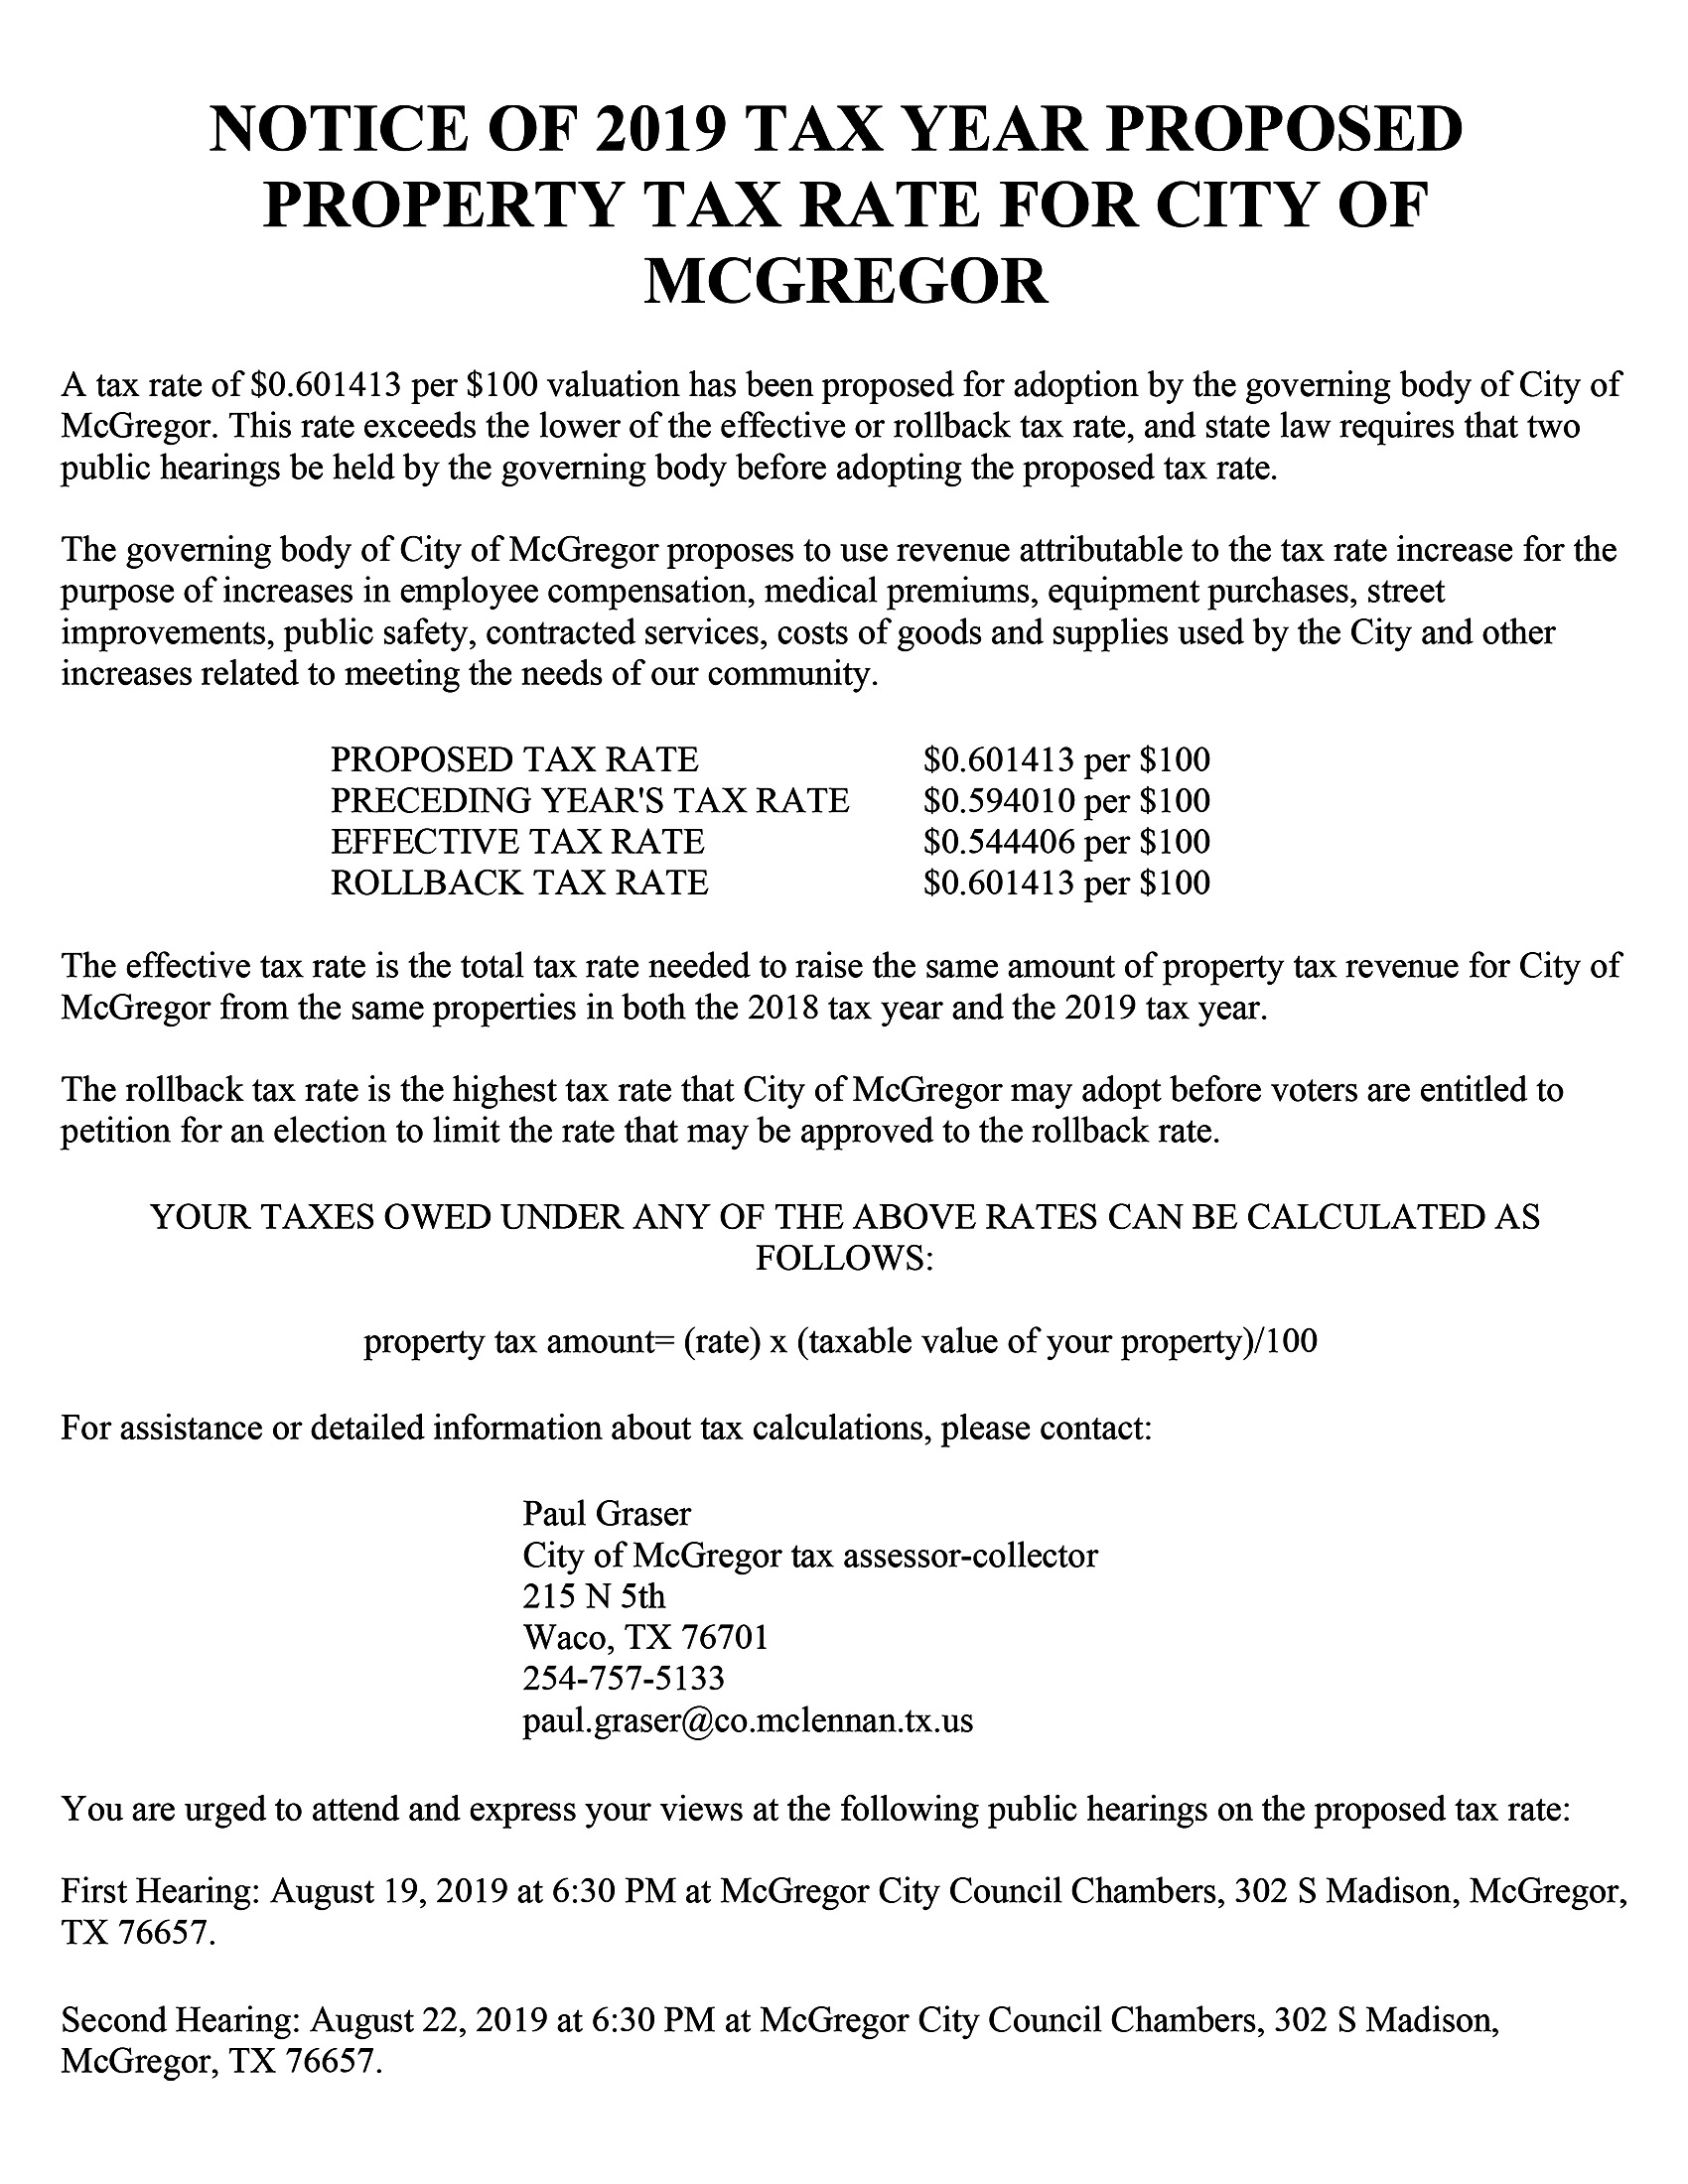 McGregor-City-ad-004